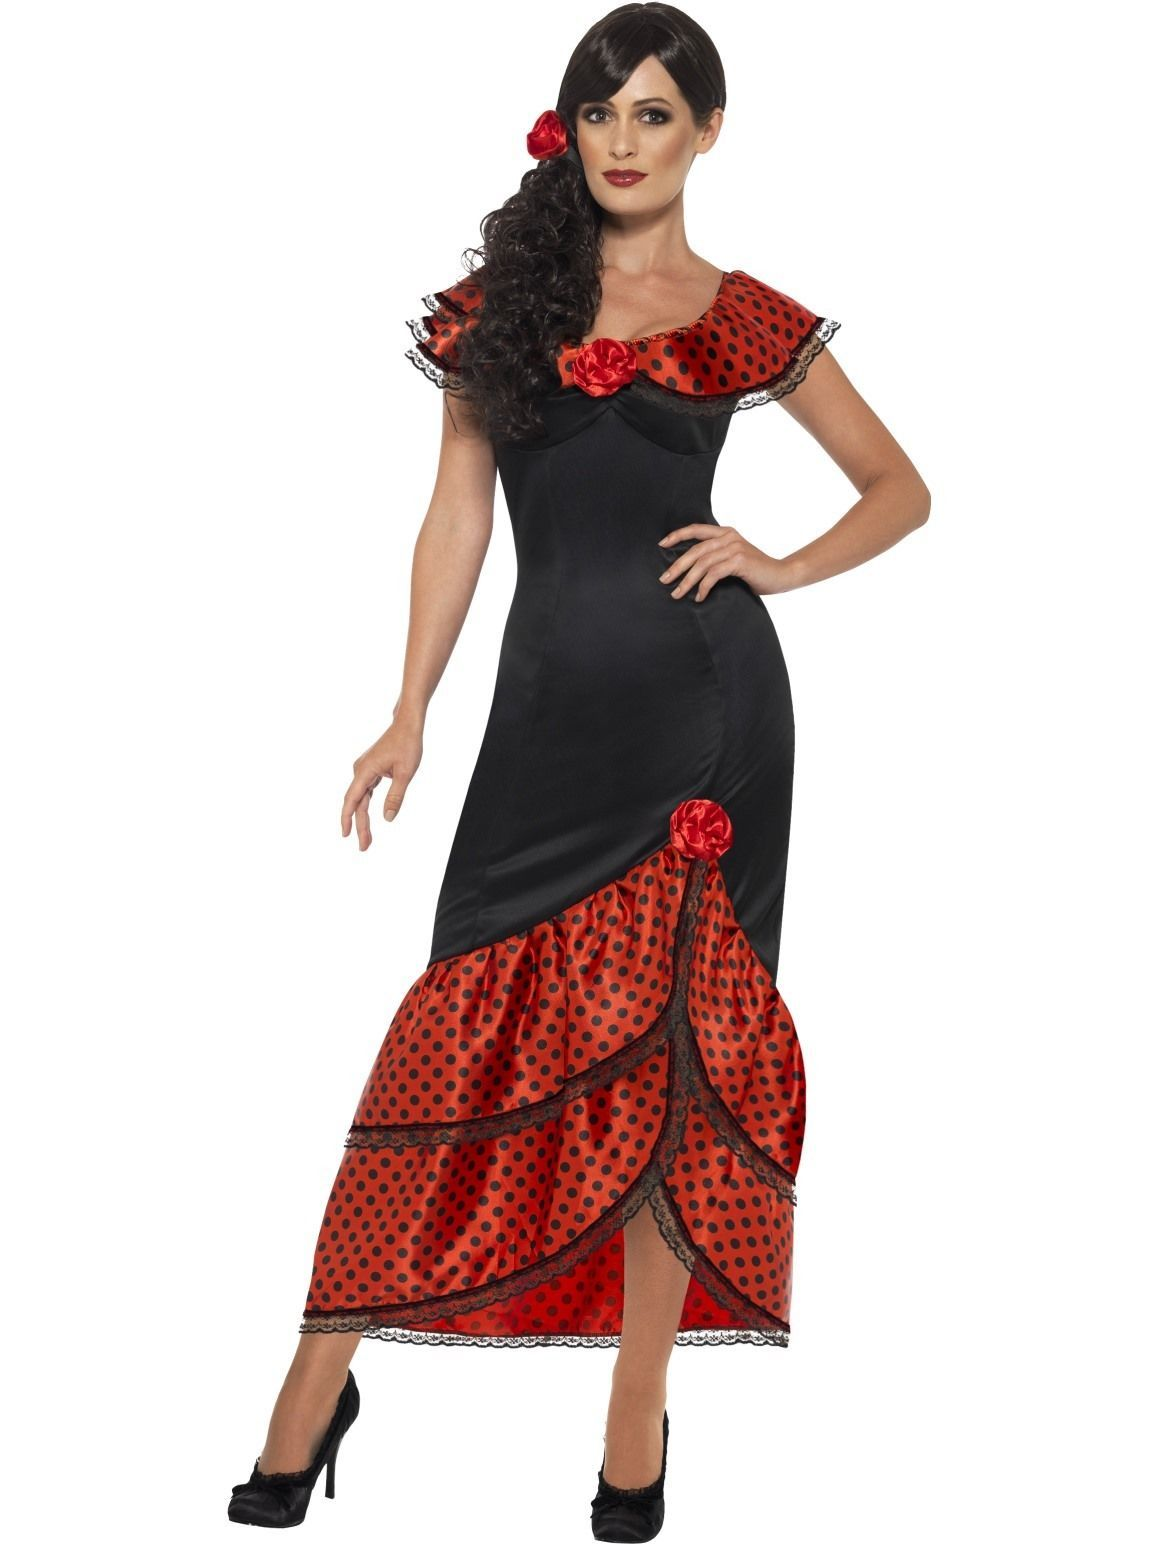 ace157971506 Flamenco Senorita Costume Spanish Mexican Saloon Dancer Fancy Dress Outfit    eBay